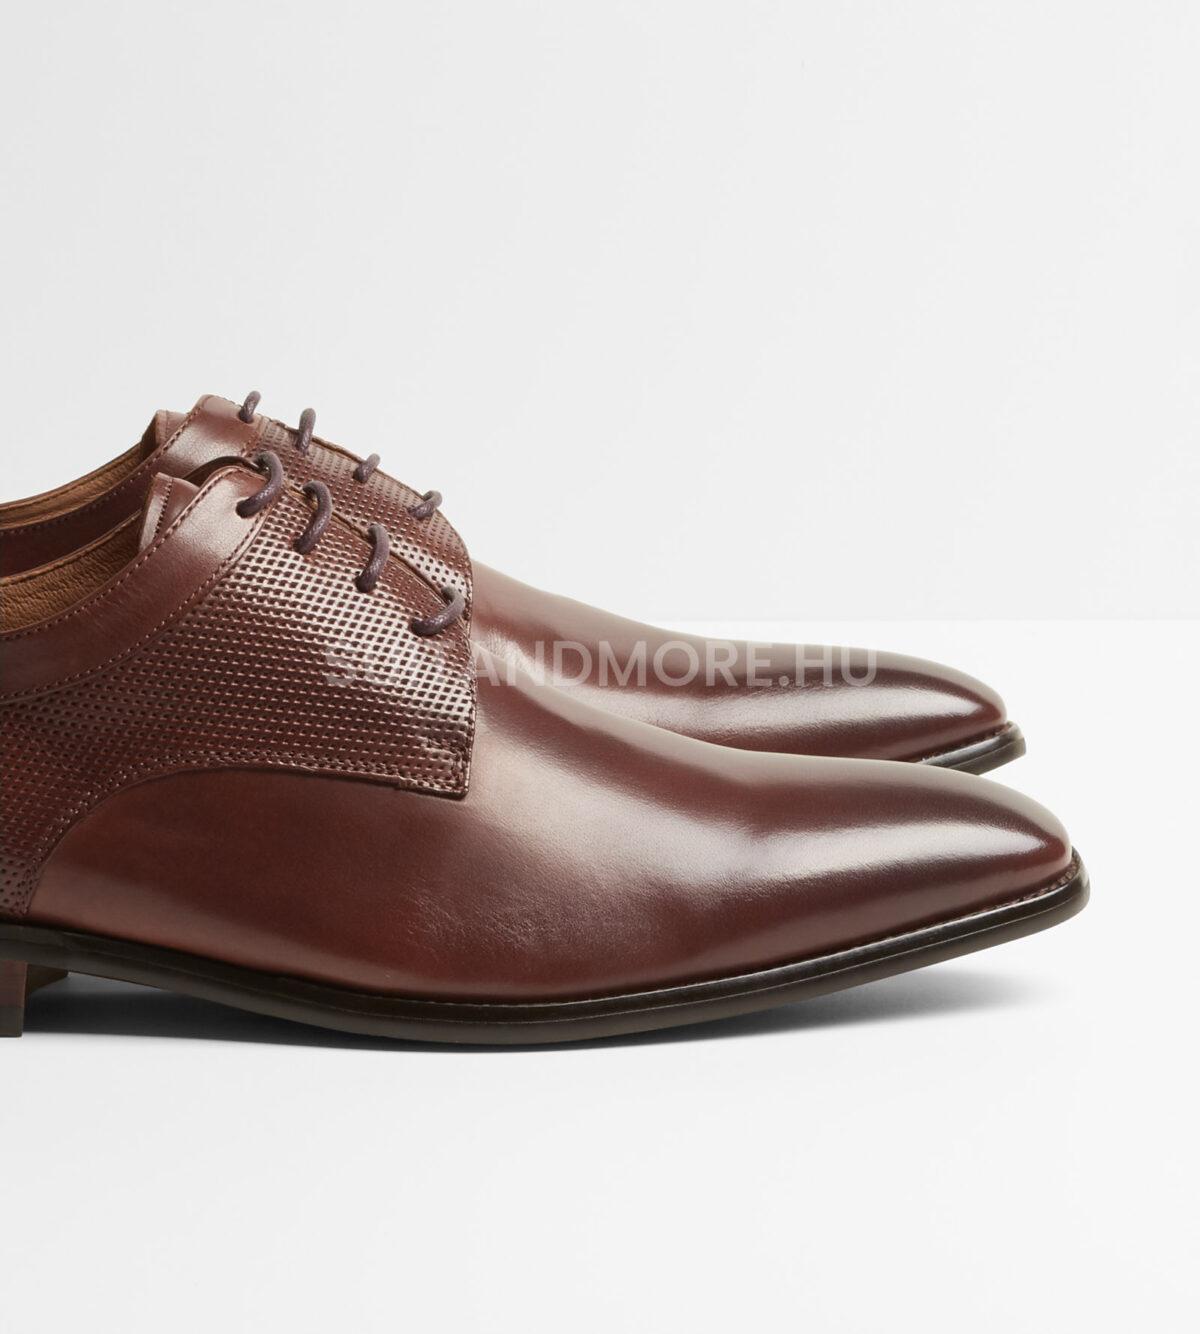 DIGEL-középbarna-fűzős-derby-cipő-SYRAKUS-1001907-32-02